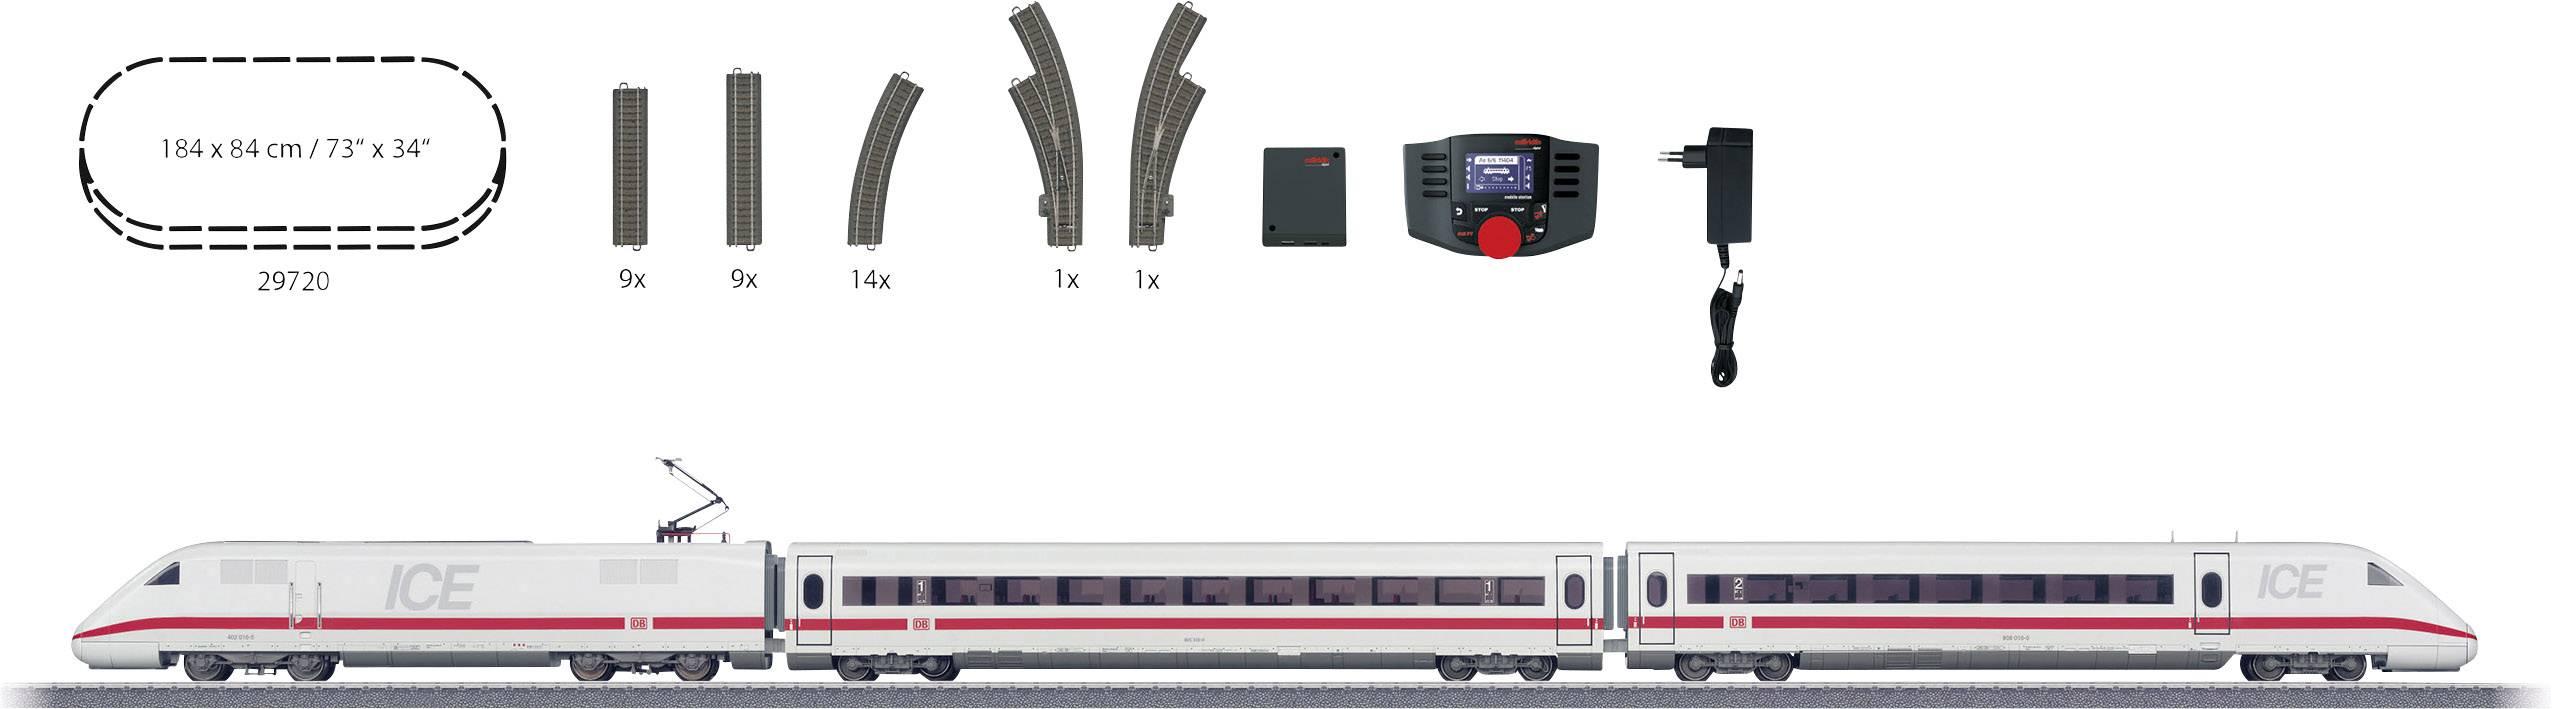 H0 startovací sada s vlakovou soupravou ICE 2 od DB AG Märklin 29792